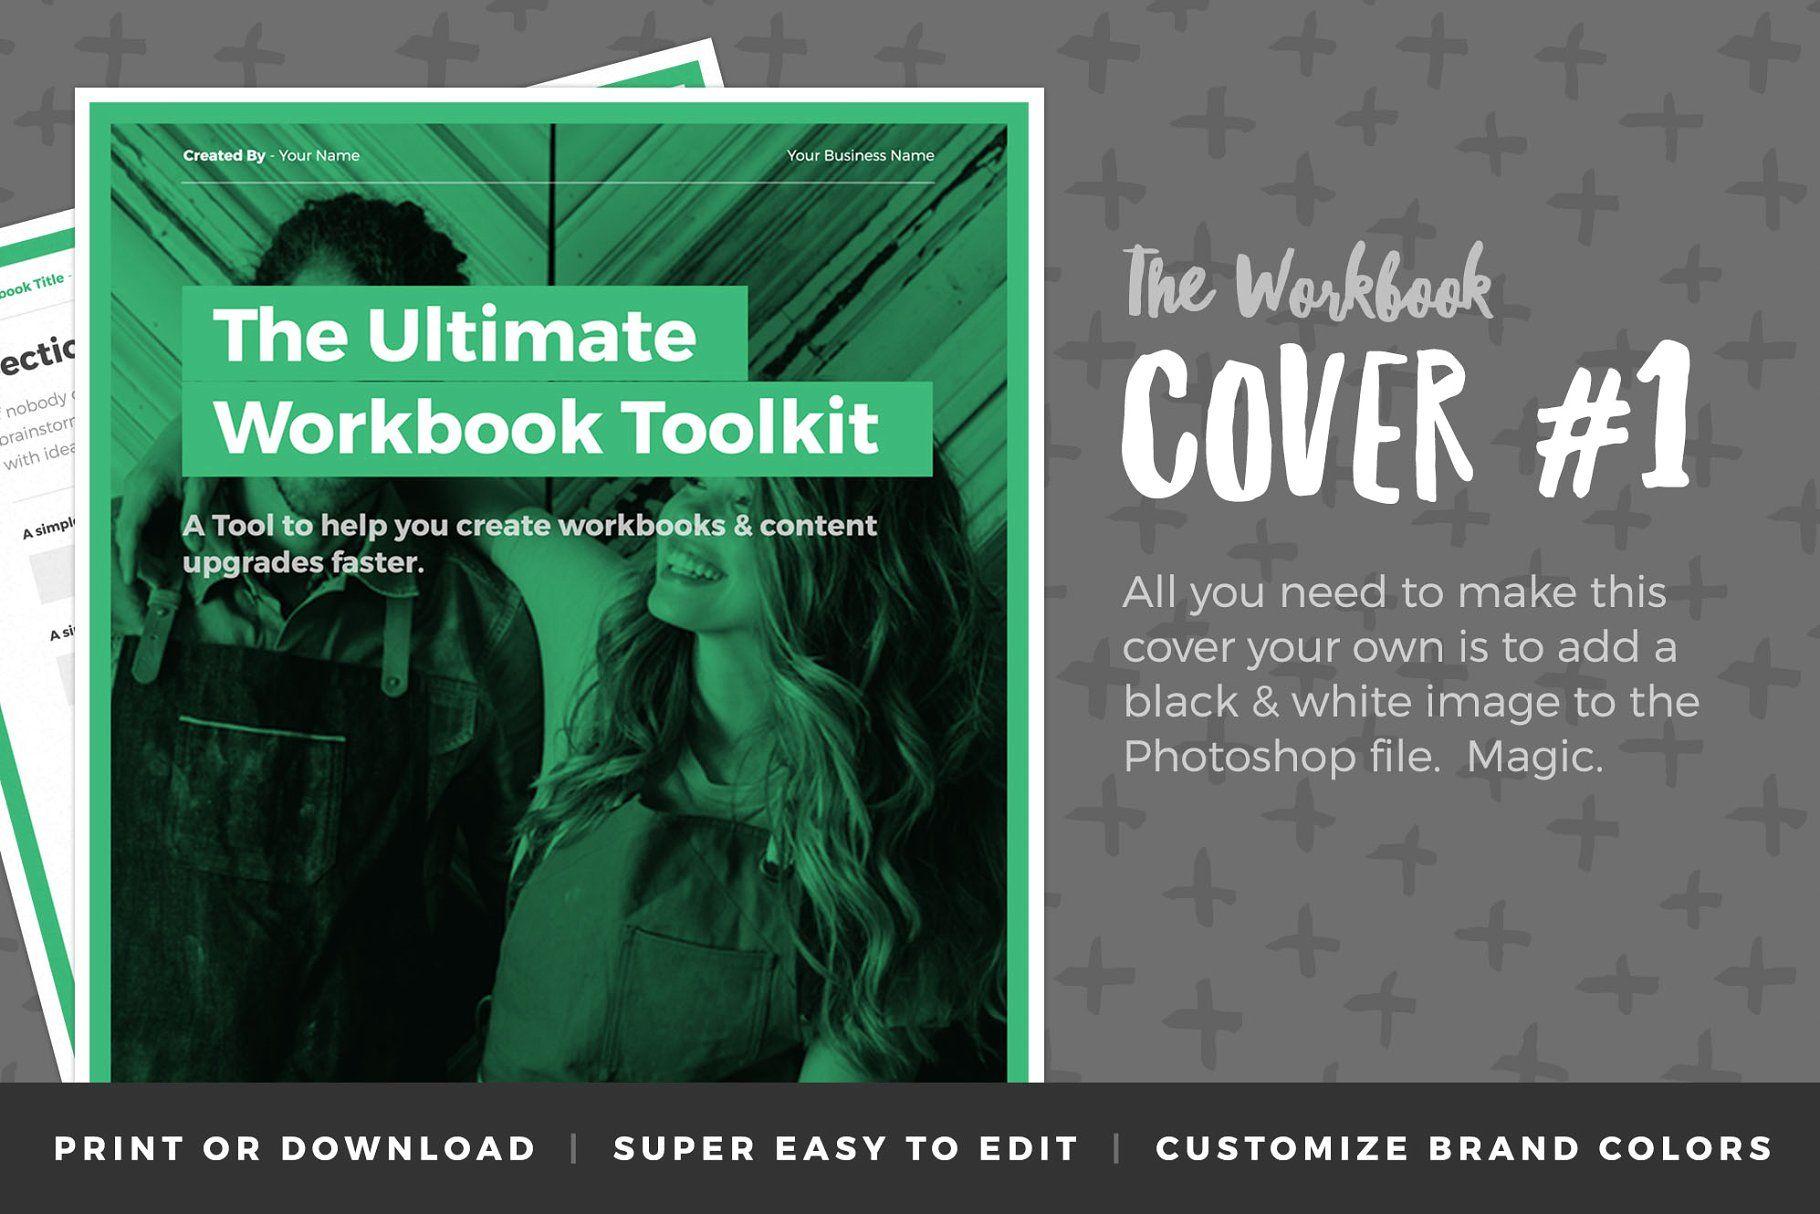 Workbook Toolkit